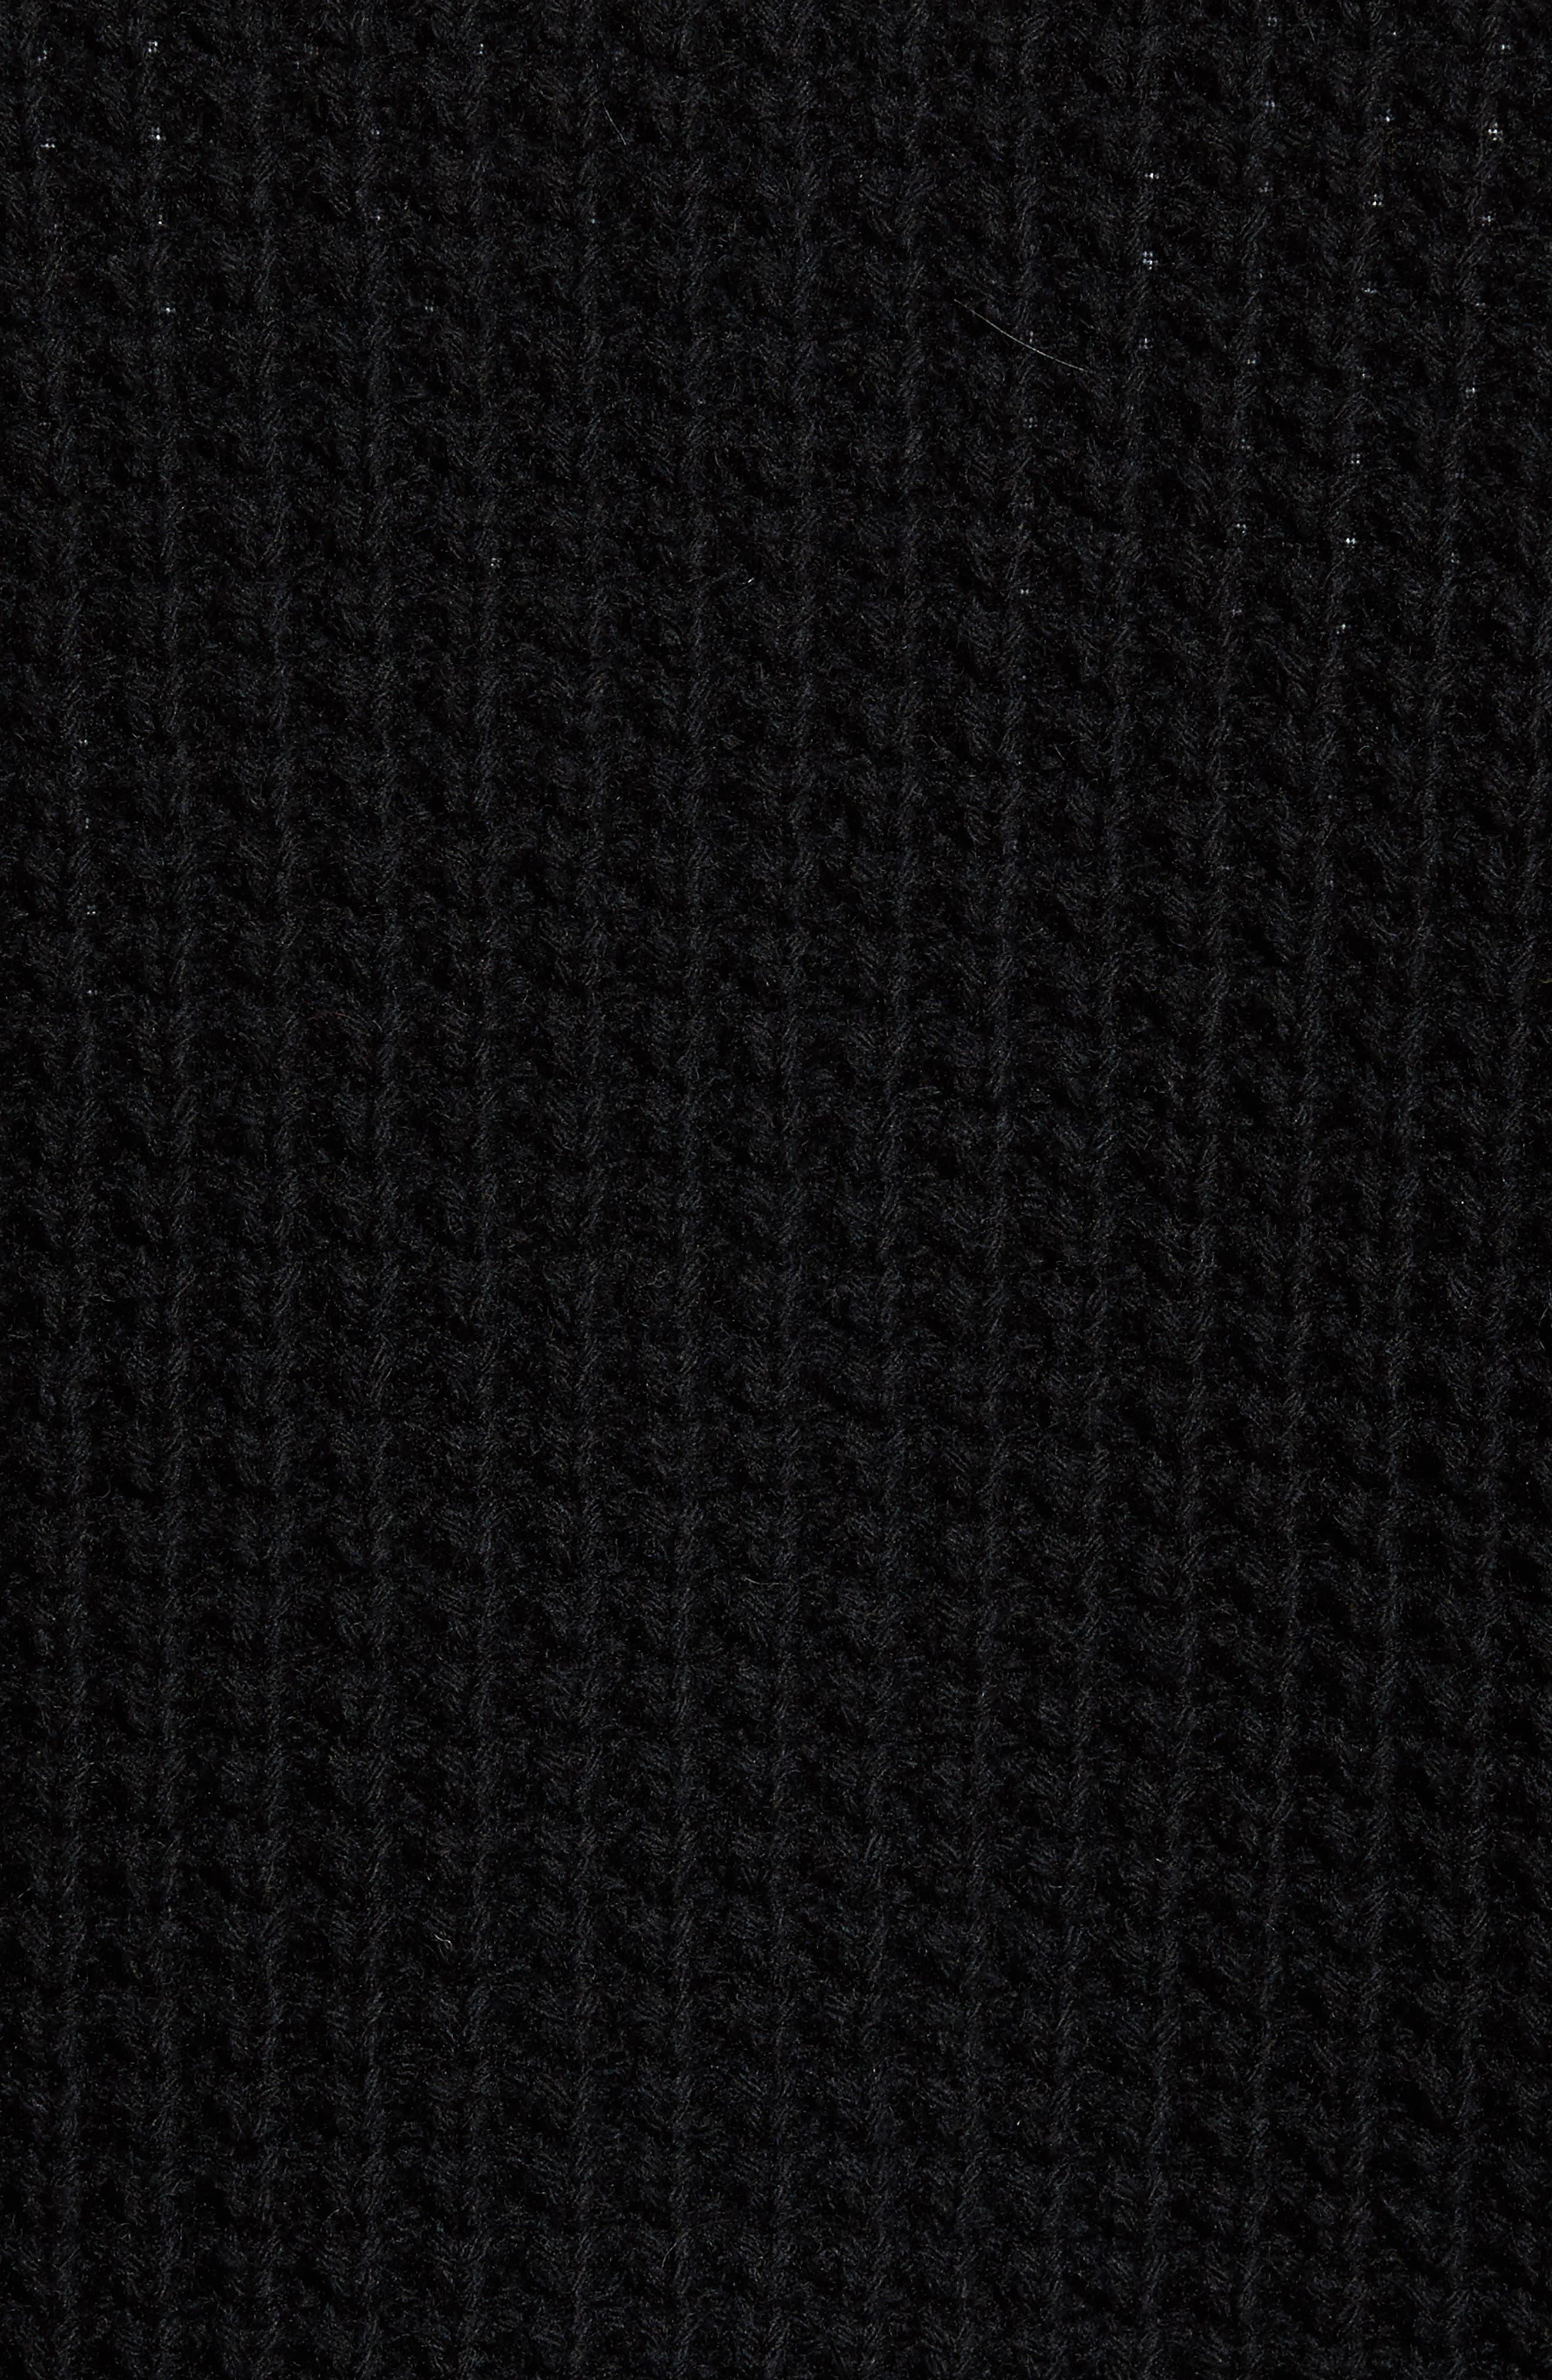 Trim Fit Knit Cardigan Jacket,                             Alternate thumbnail 5, color,                             001